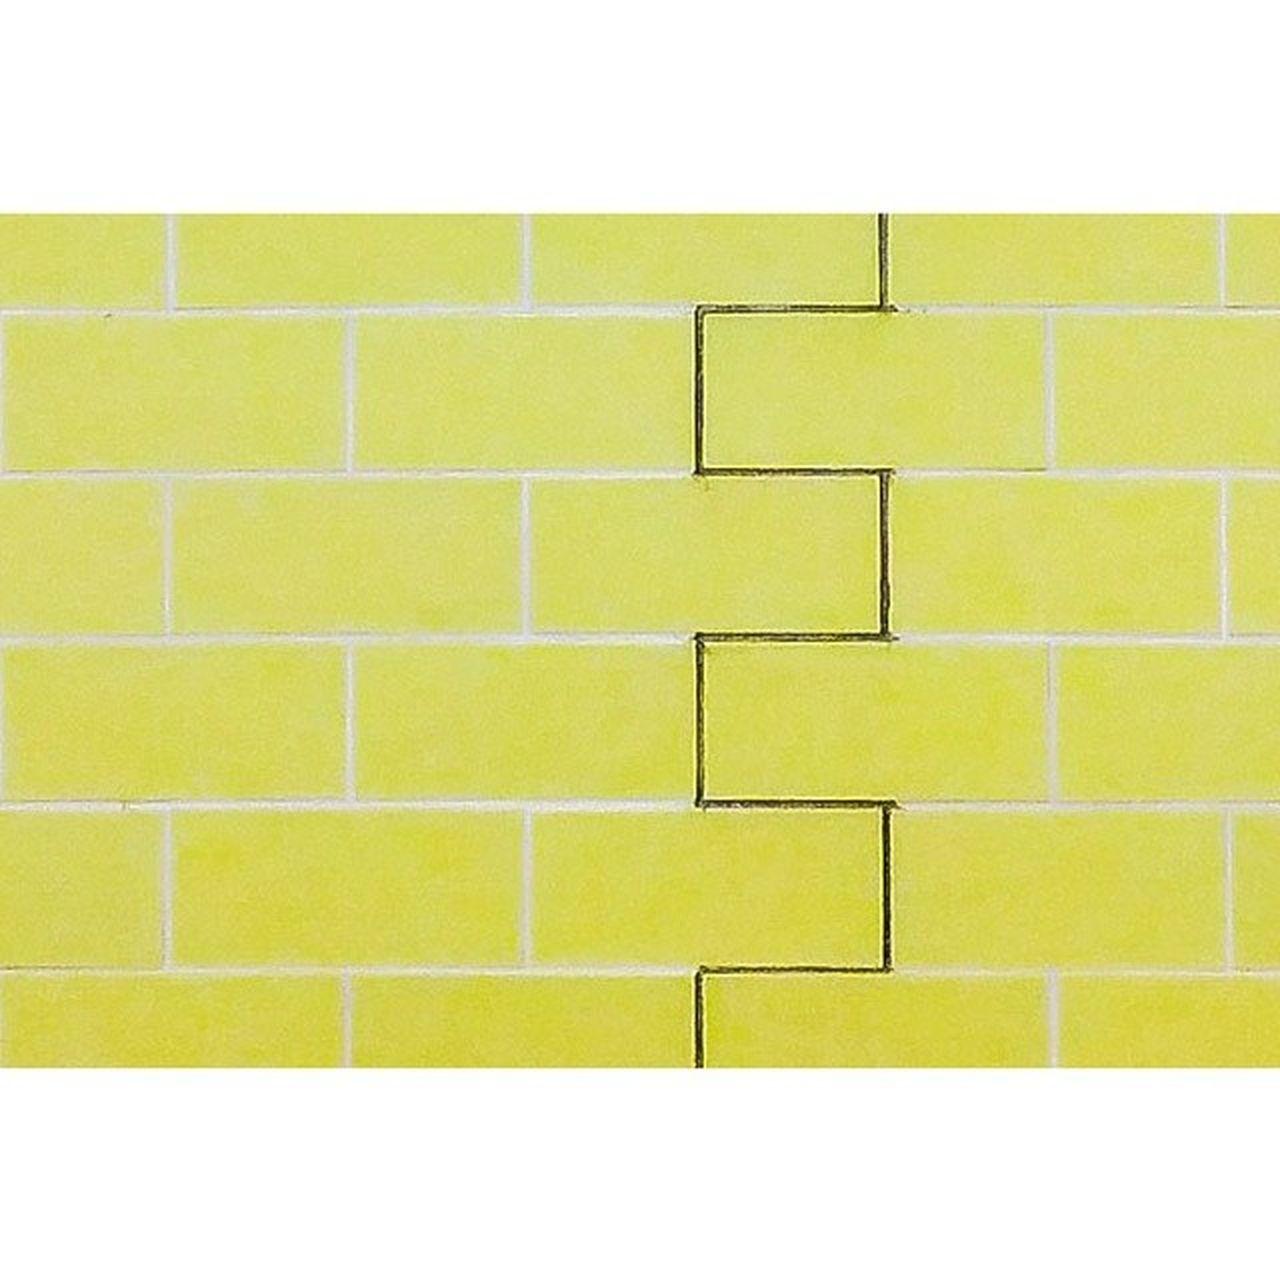 Full Frame Image Of Yellow Brick Wall